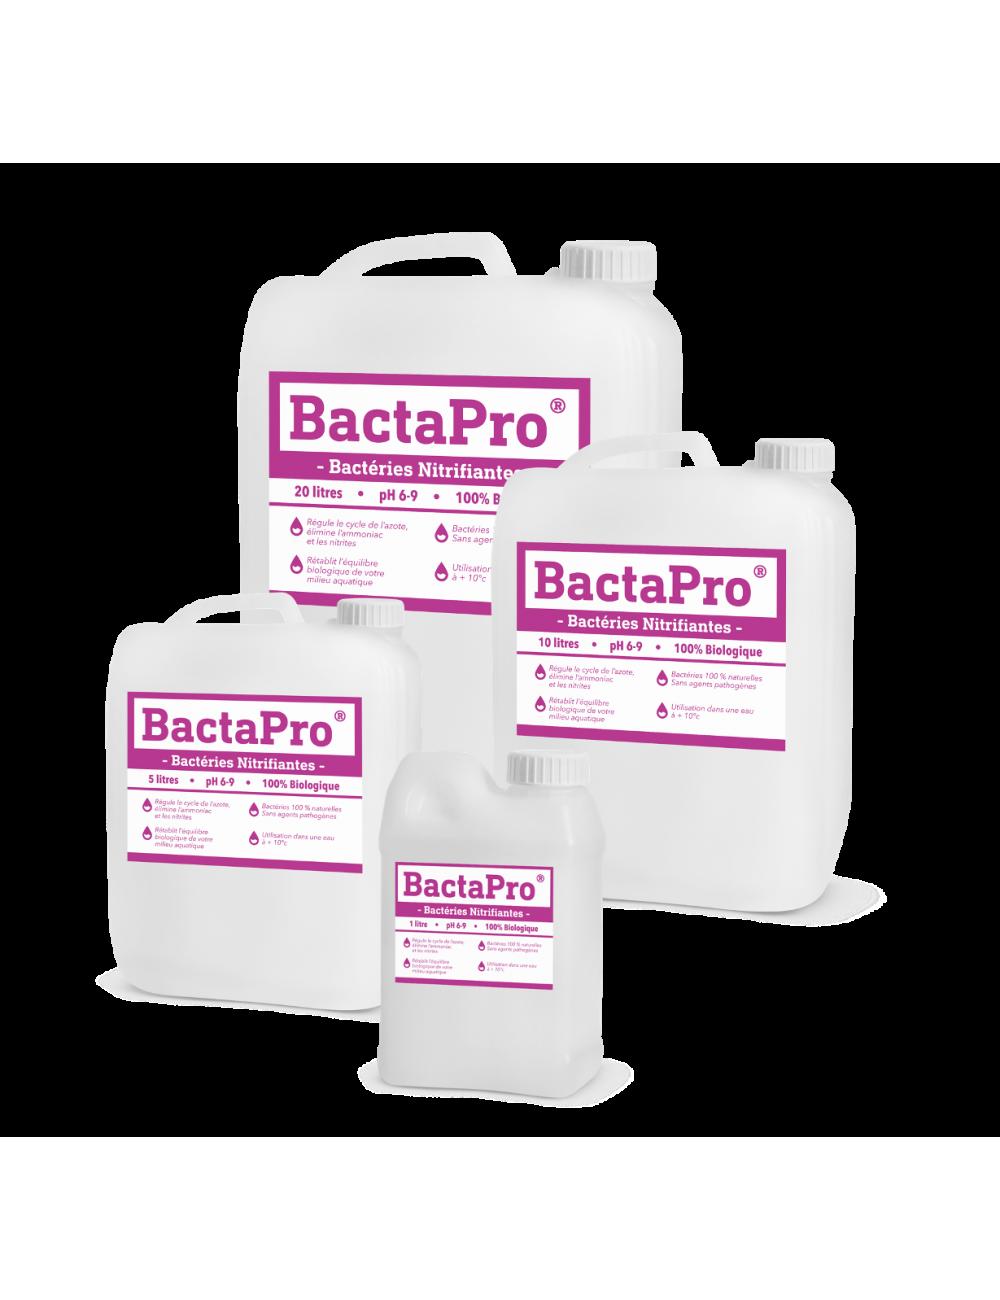 bactérie nitrifiante - BactaPro®